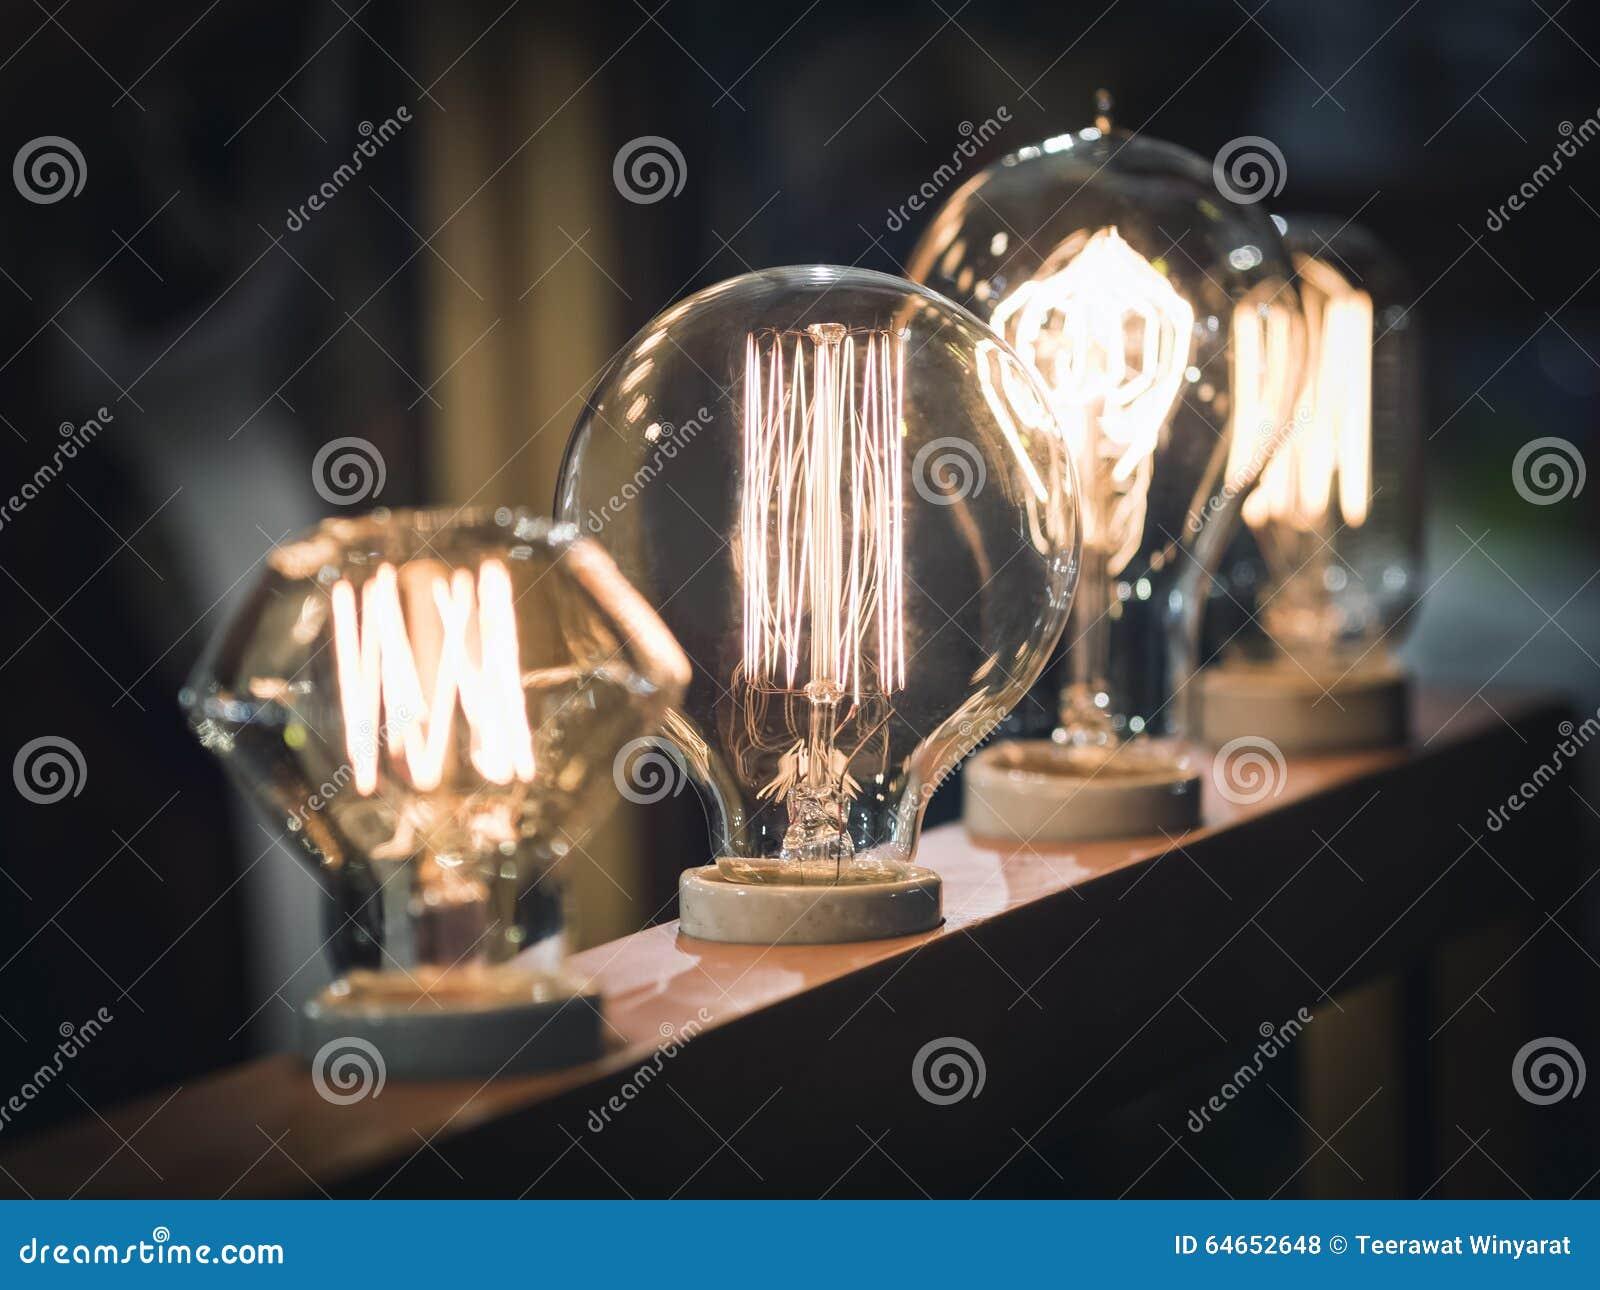 vintage style light bulbs interior decoration display stock photo